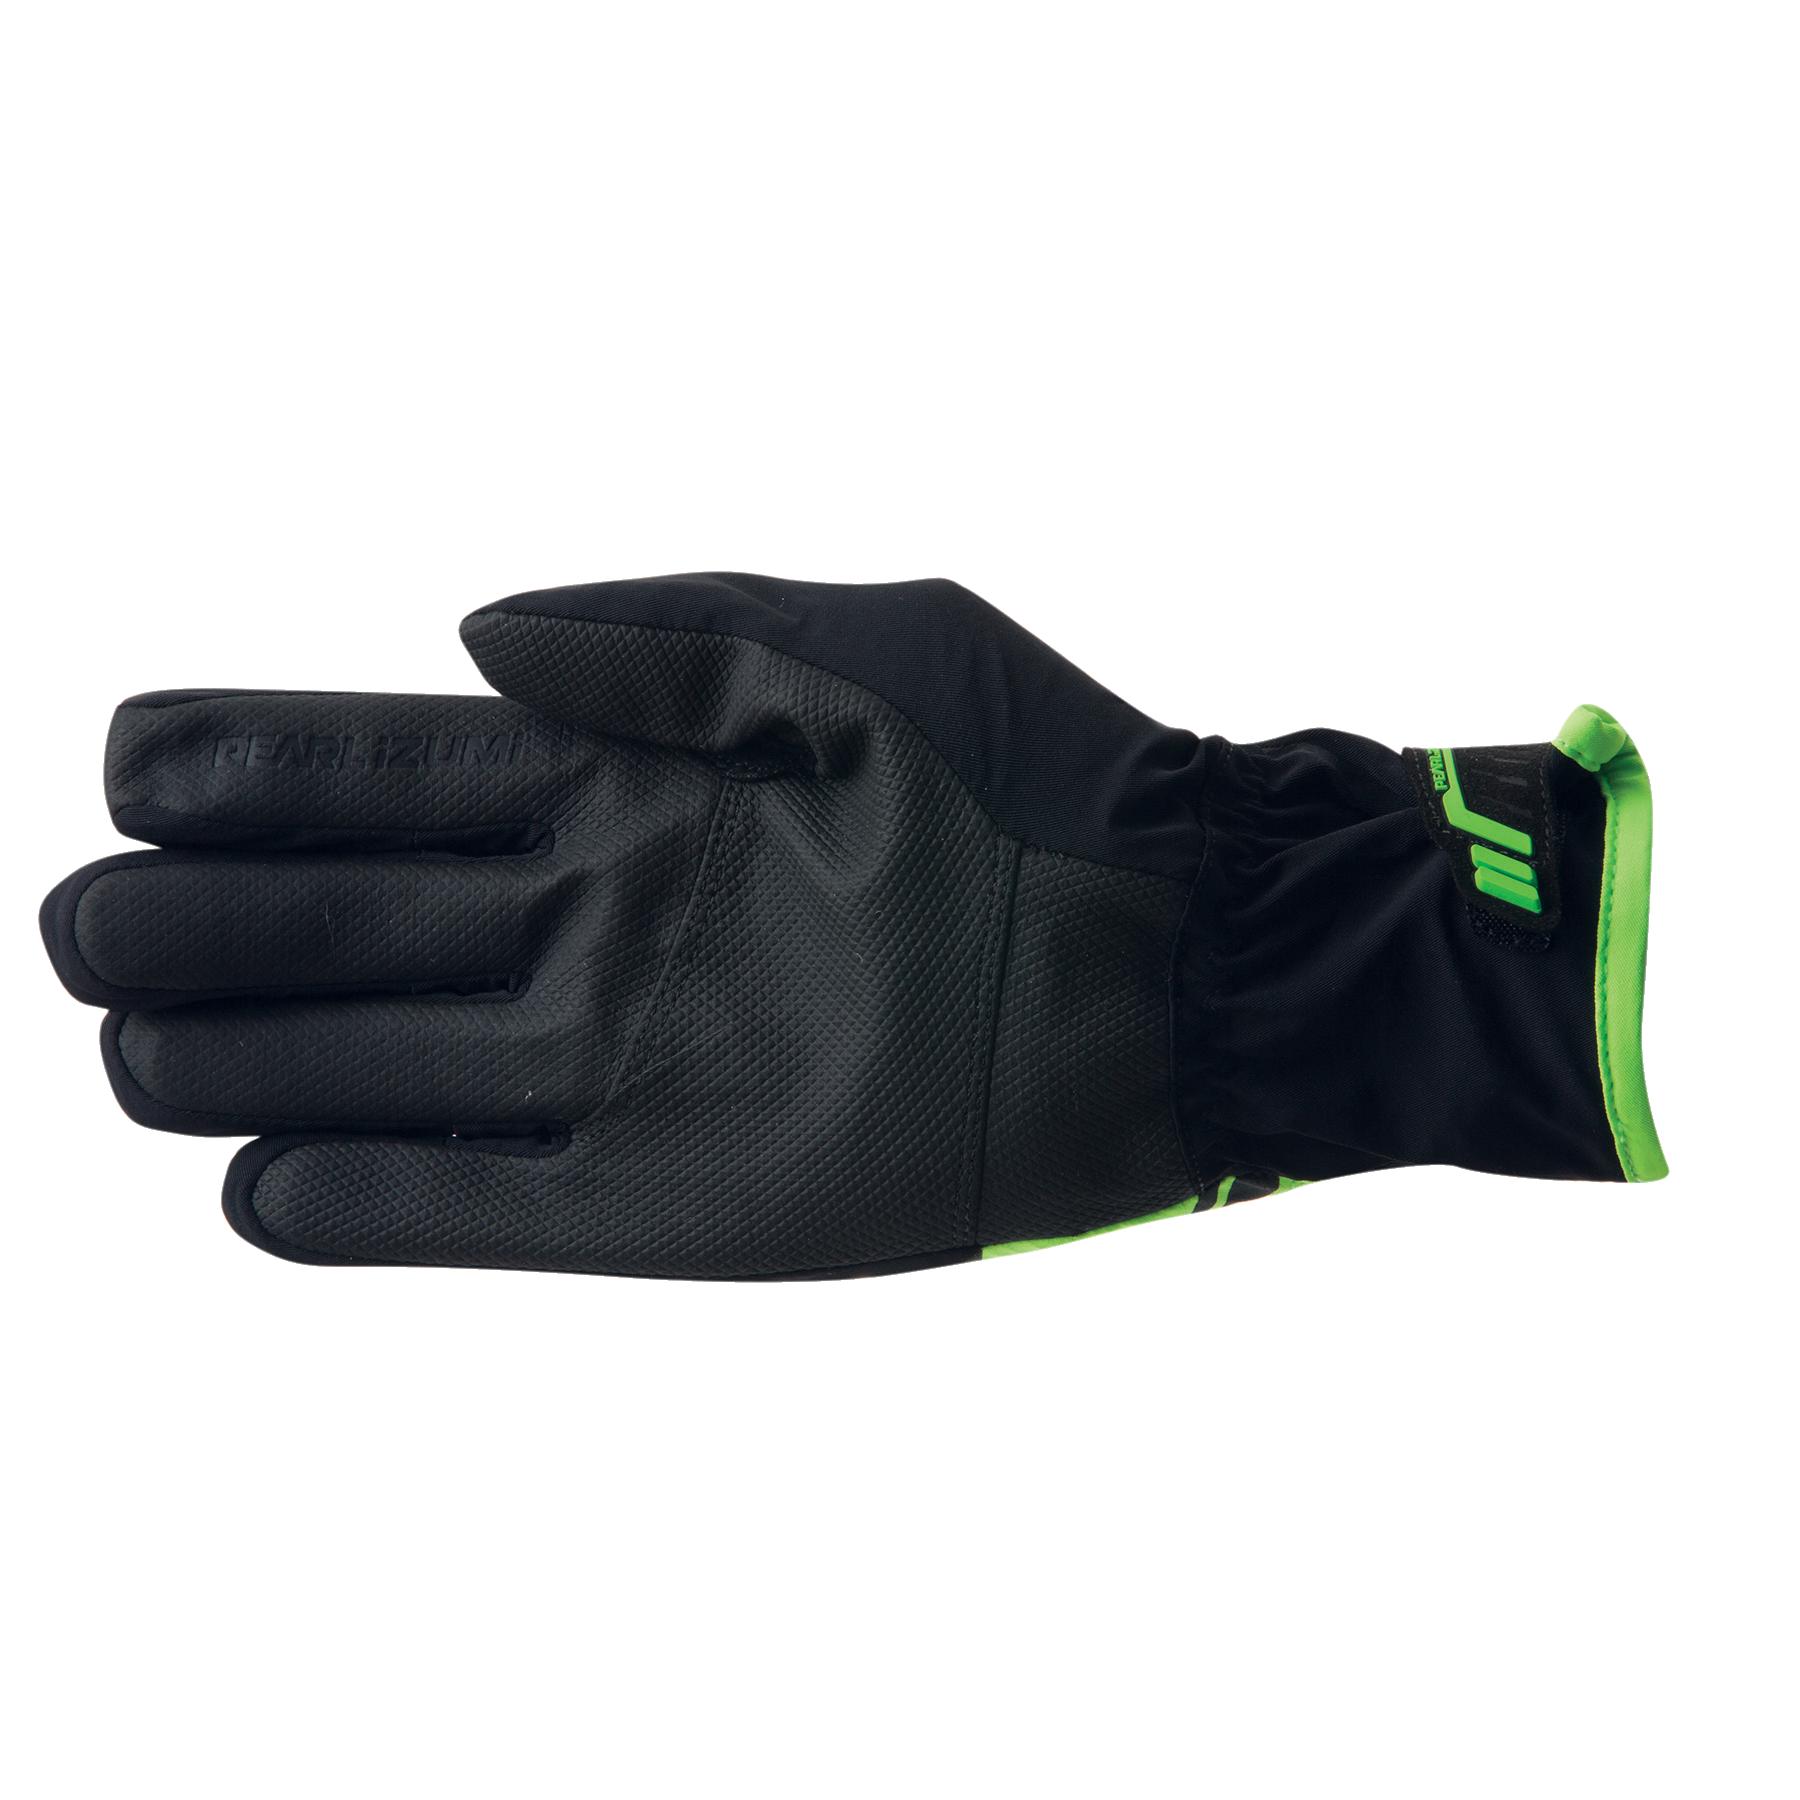 PEARL iZUMi PRO BARRIER WXB rukavice, černá, L